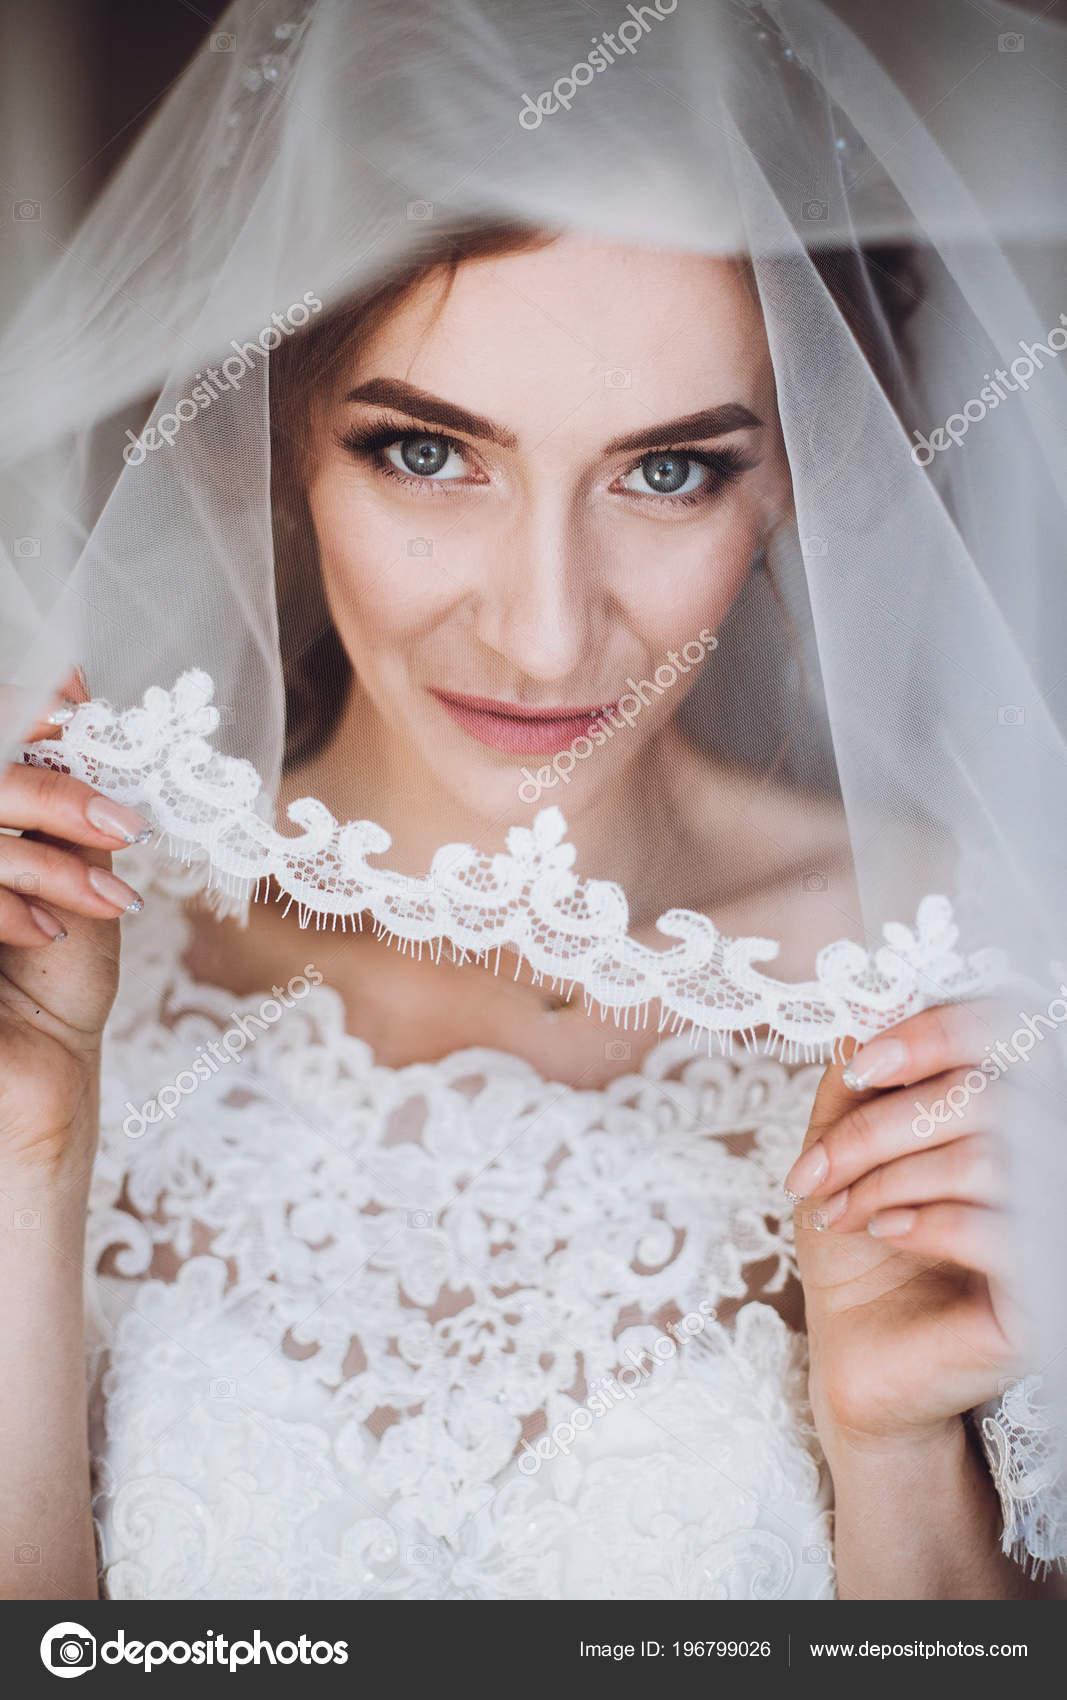 Krasna Blondyna Nevesta Elegantni Bile Krajkove Svatebni Saty Zavoj